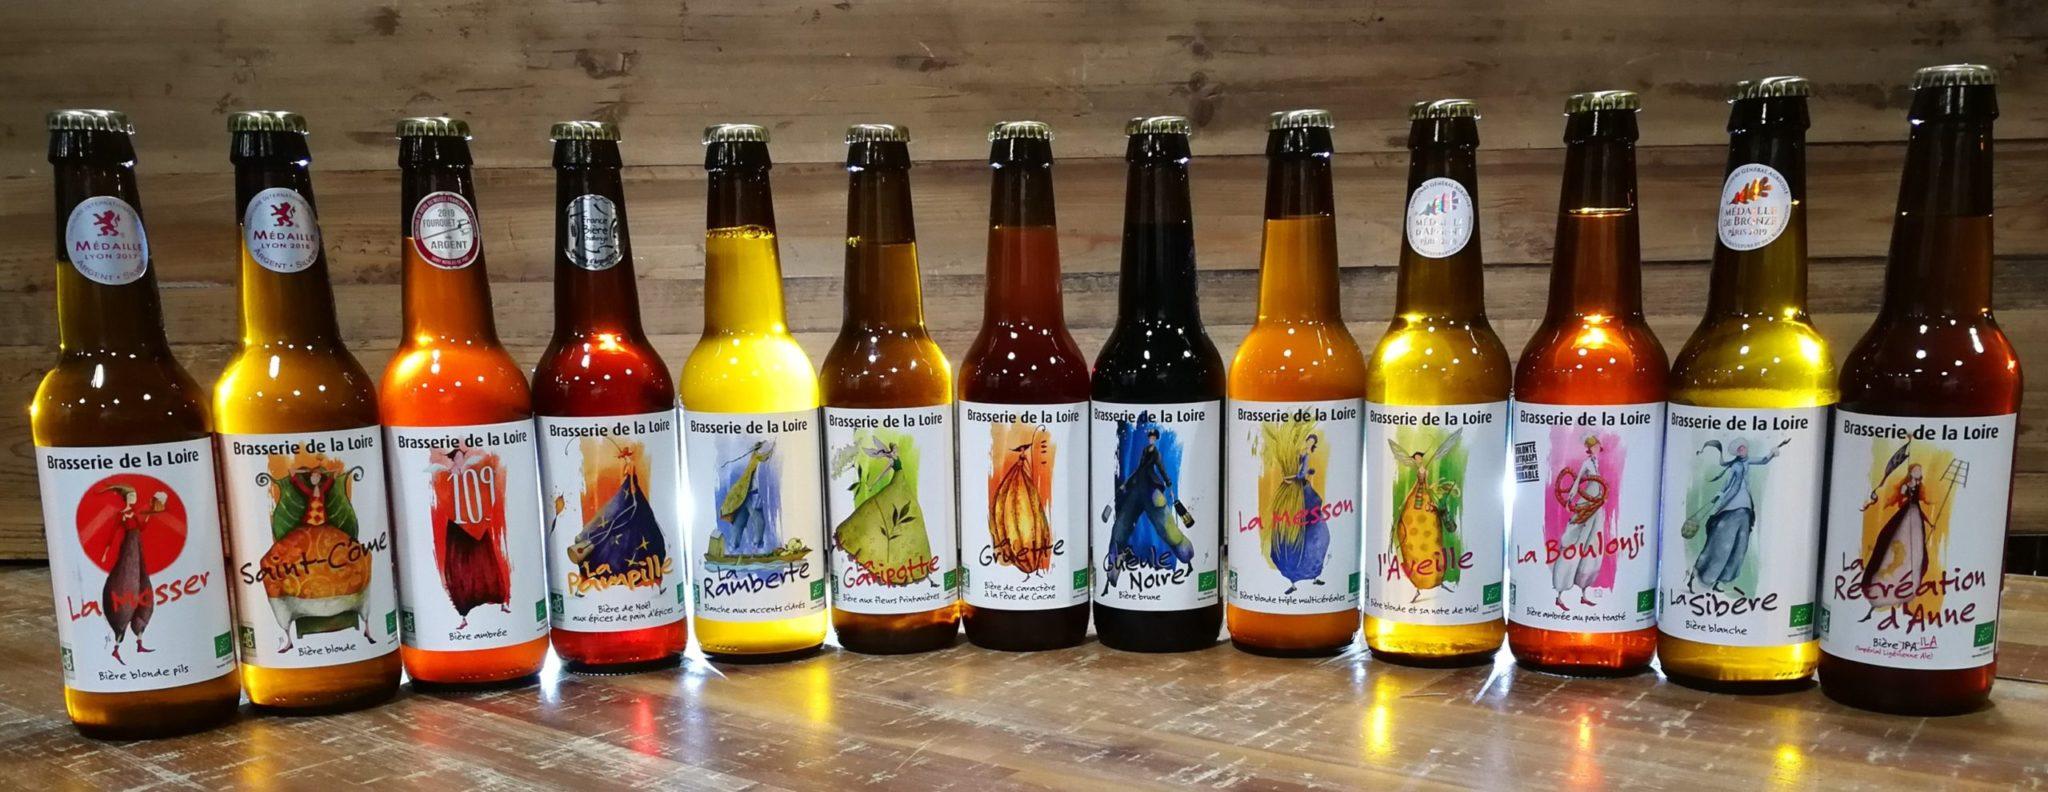 Bière brasserie de la Loire